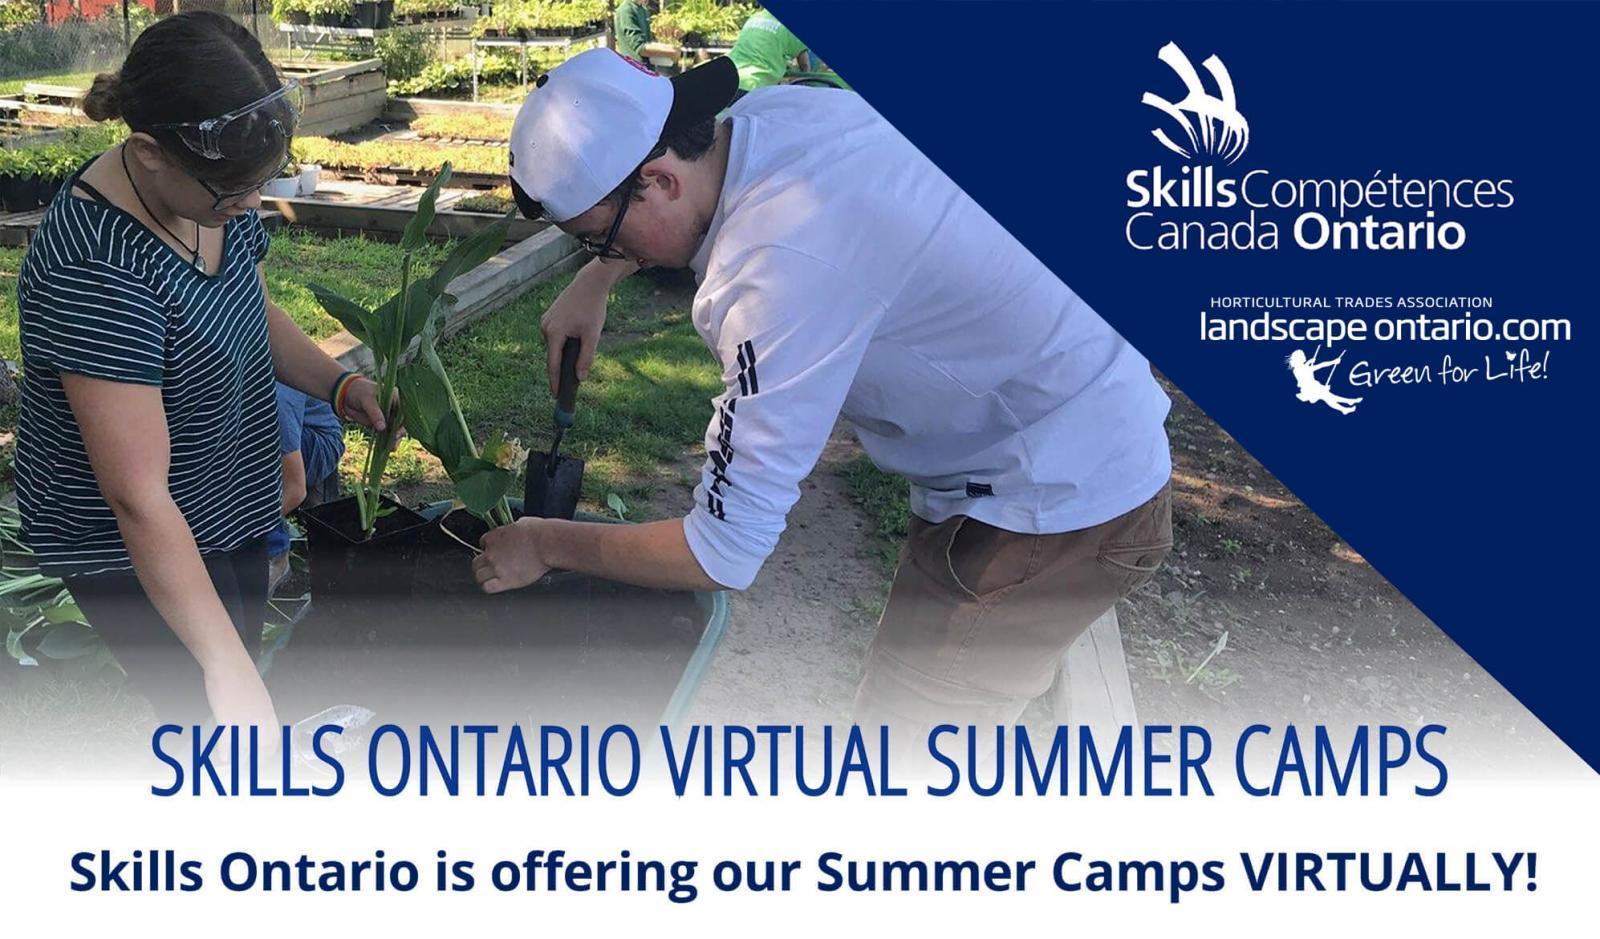 Skills Ontario 2020 Summer Camps